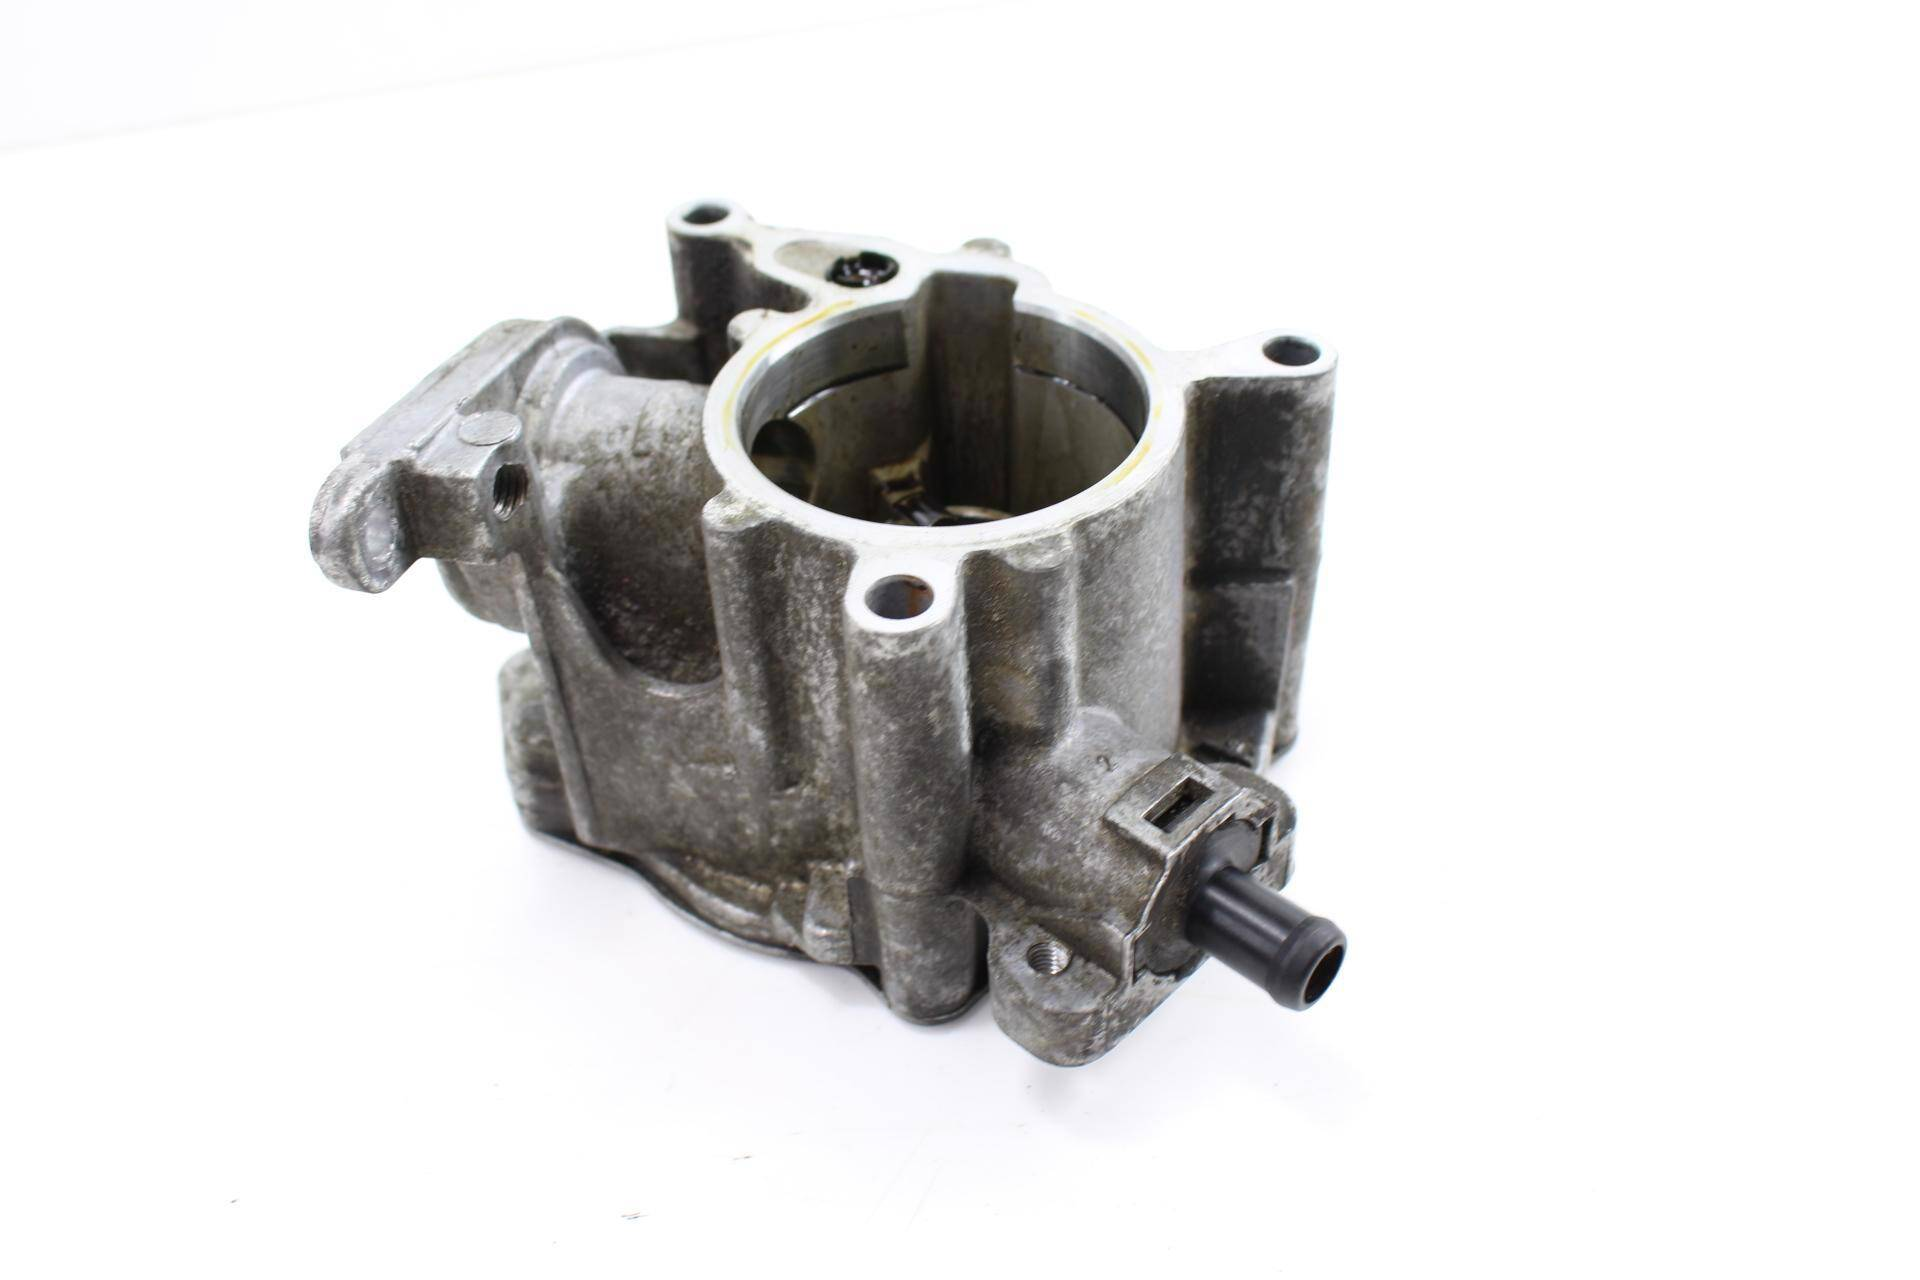 Brake Vacuum Pump Gasket For 2005-2009 Audi A4 Quattro 2.0L 4 Cyl 2008 C445RZ